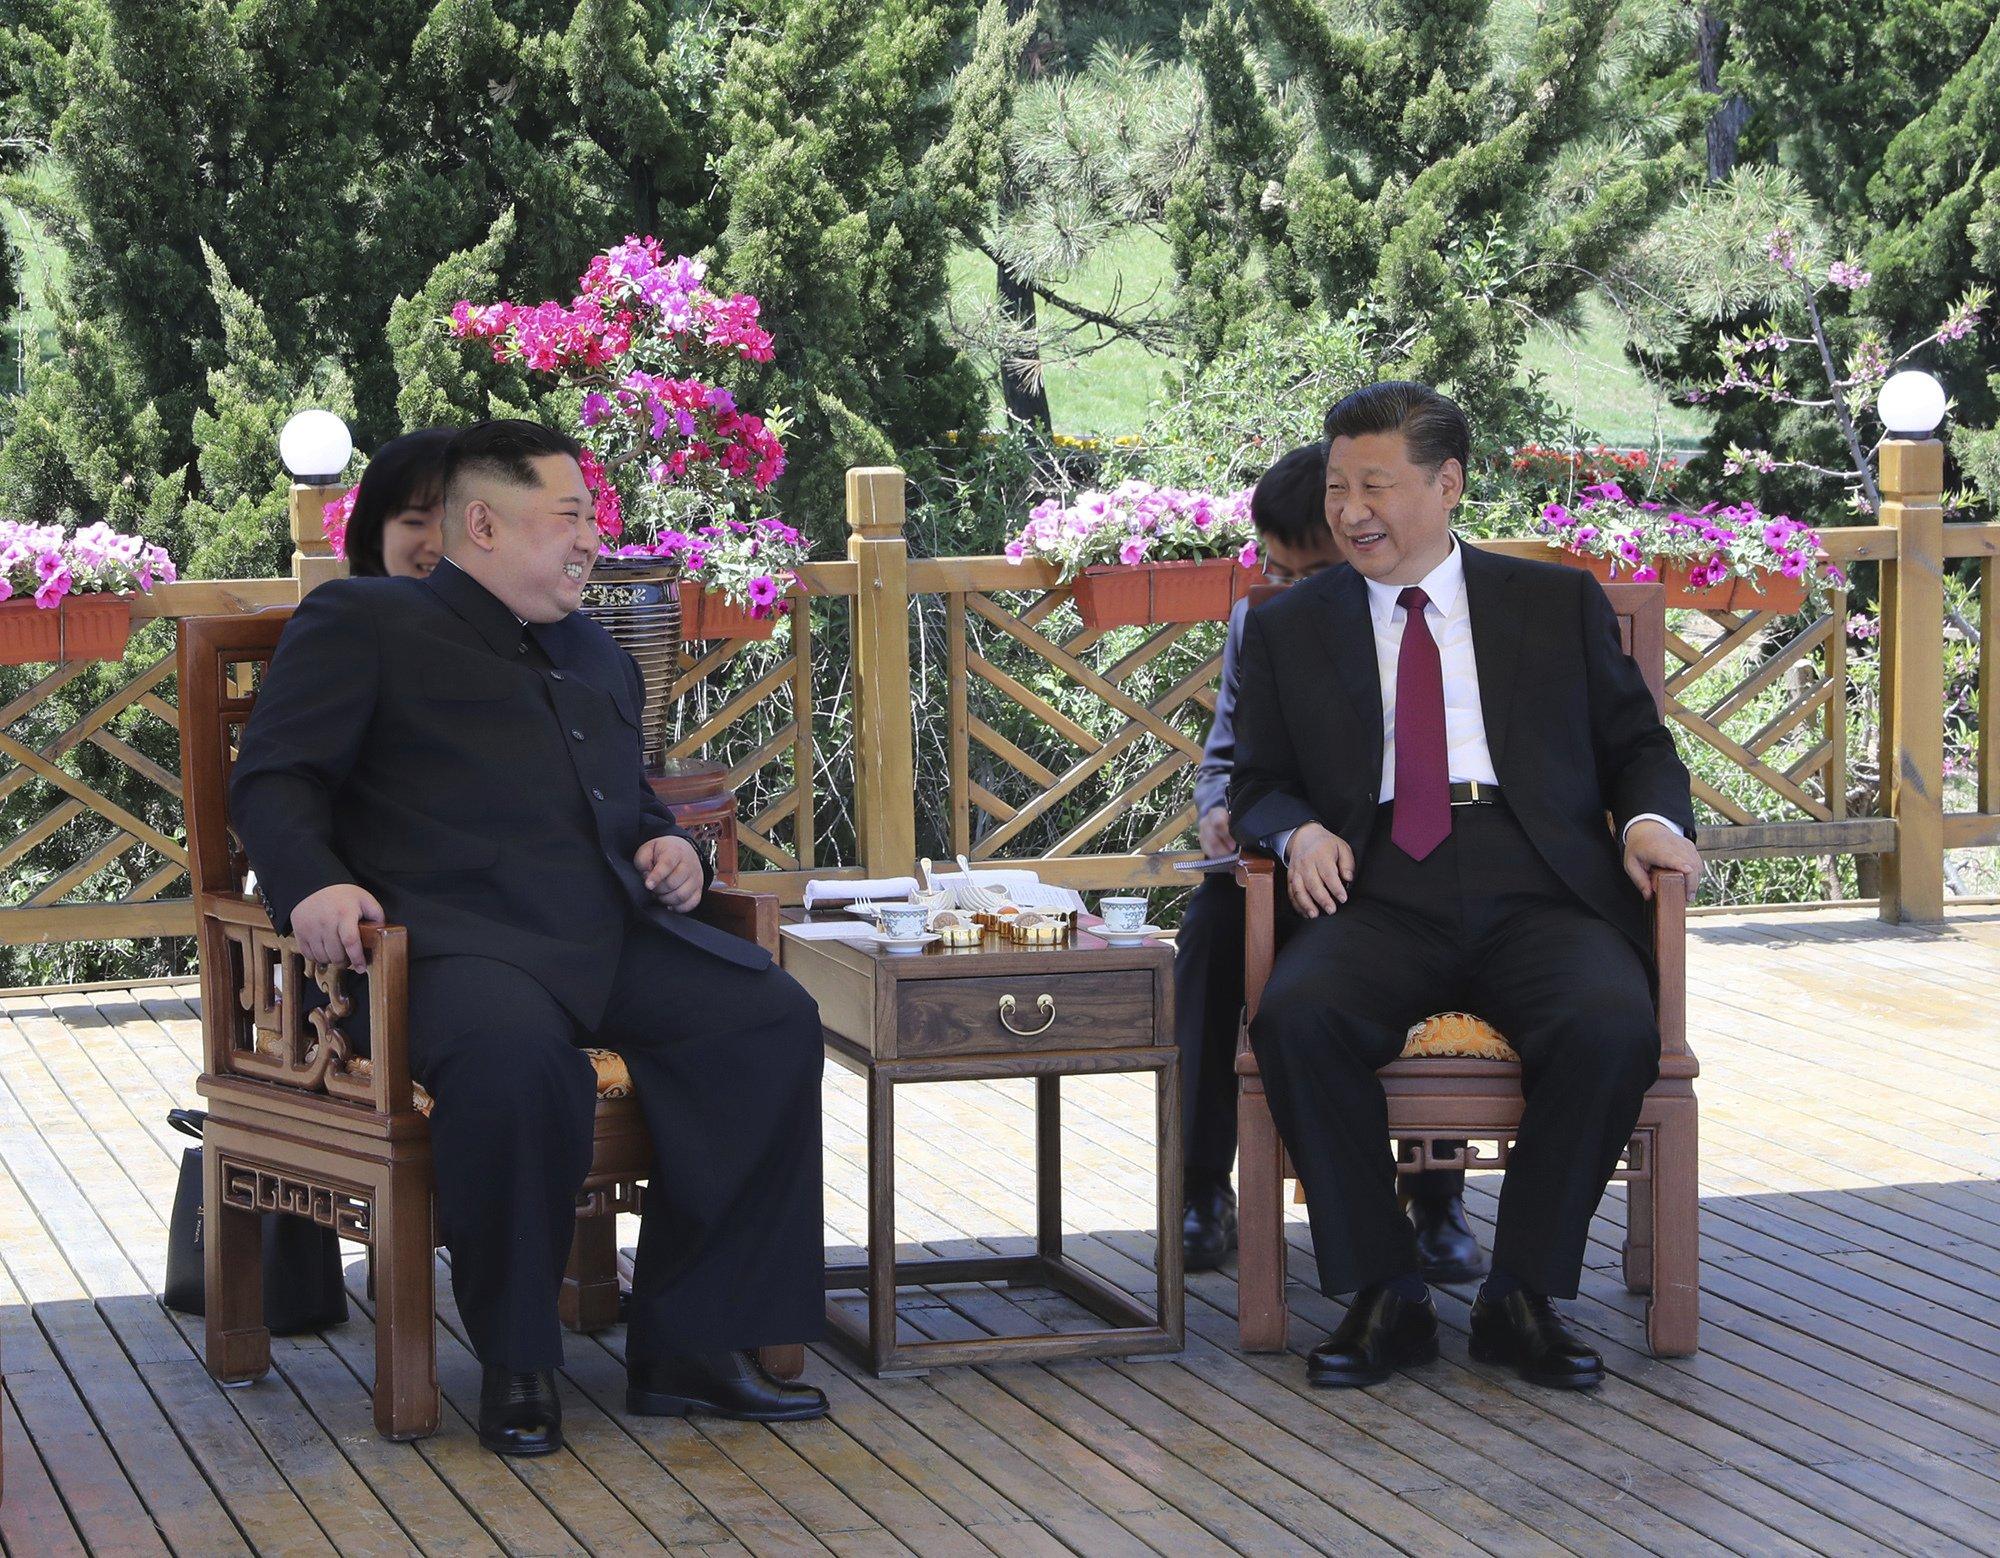 N. Korea's Kim meets China's president ahead of Trump summit